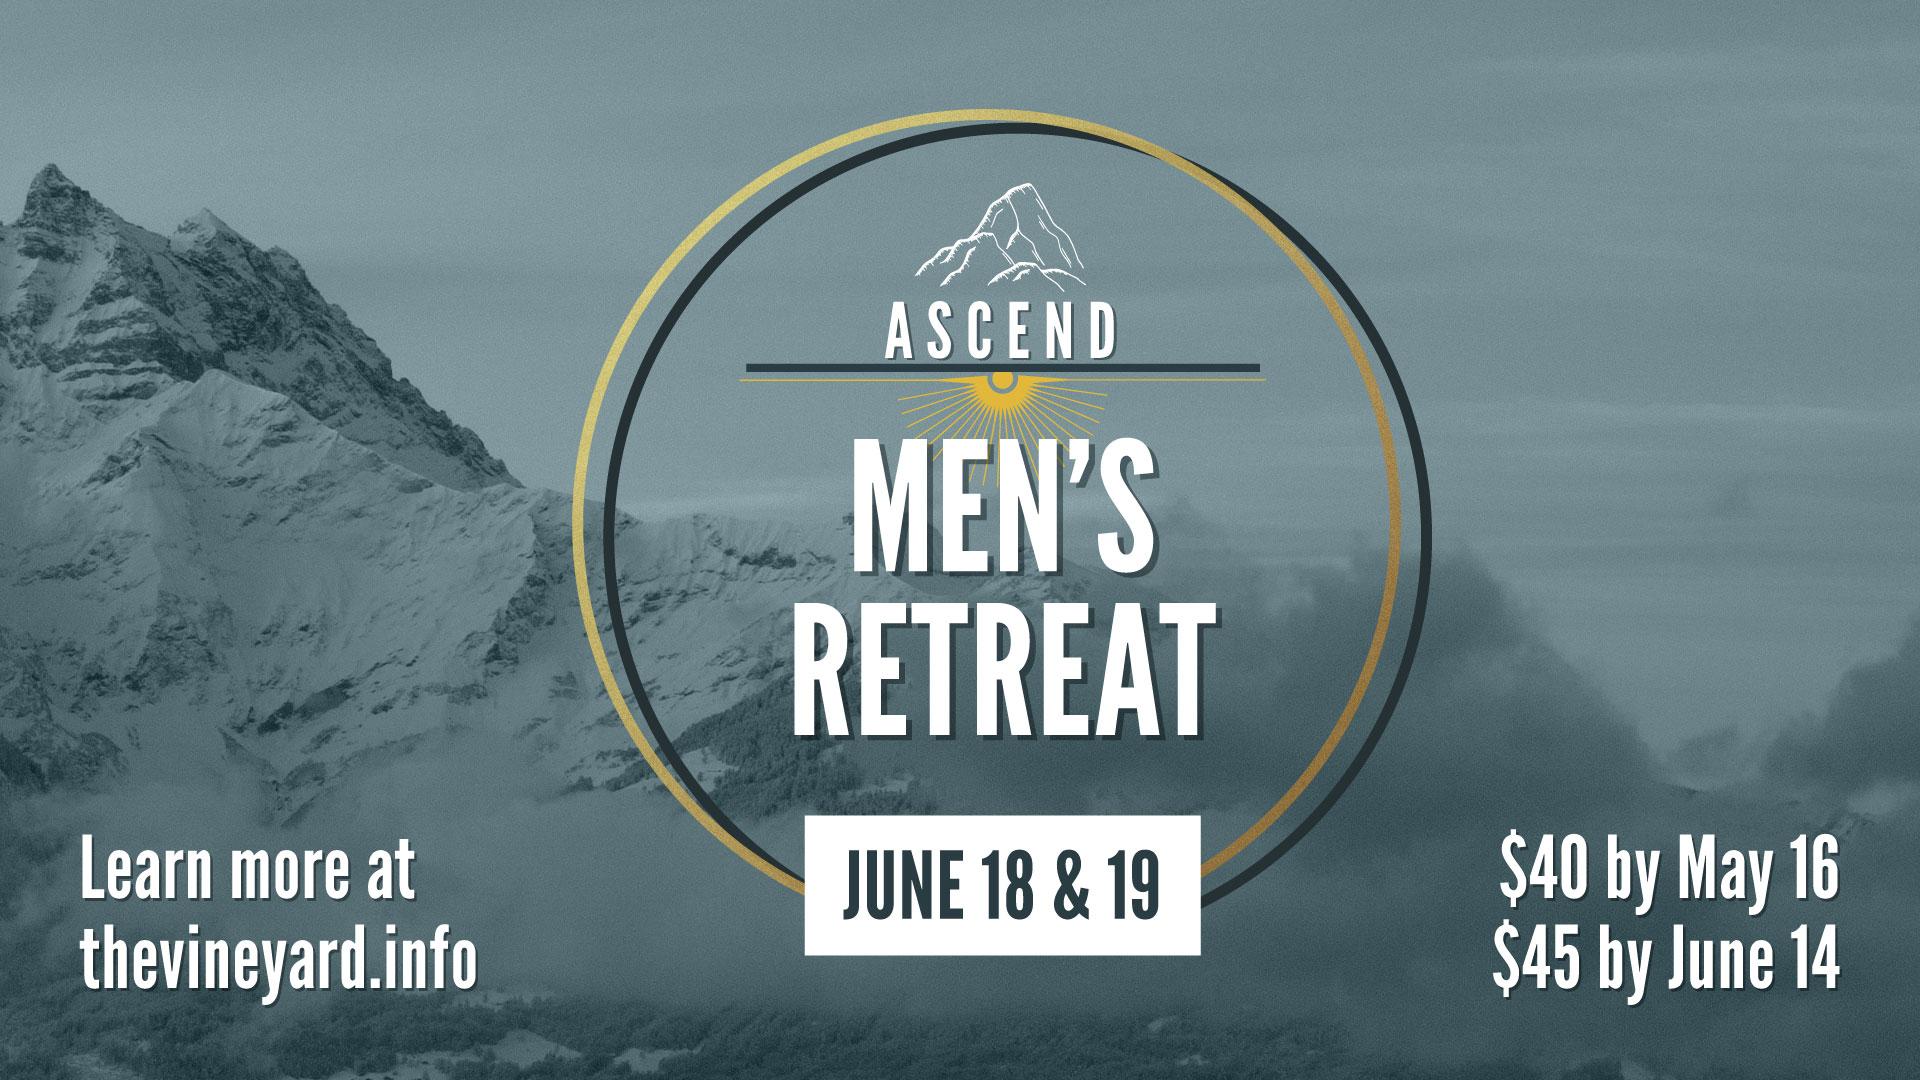 Ascend Men